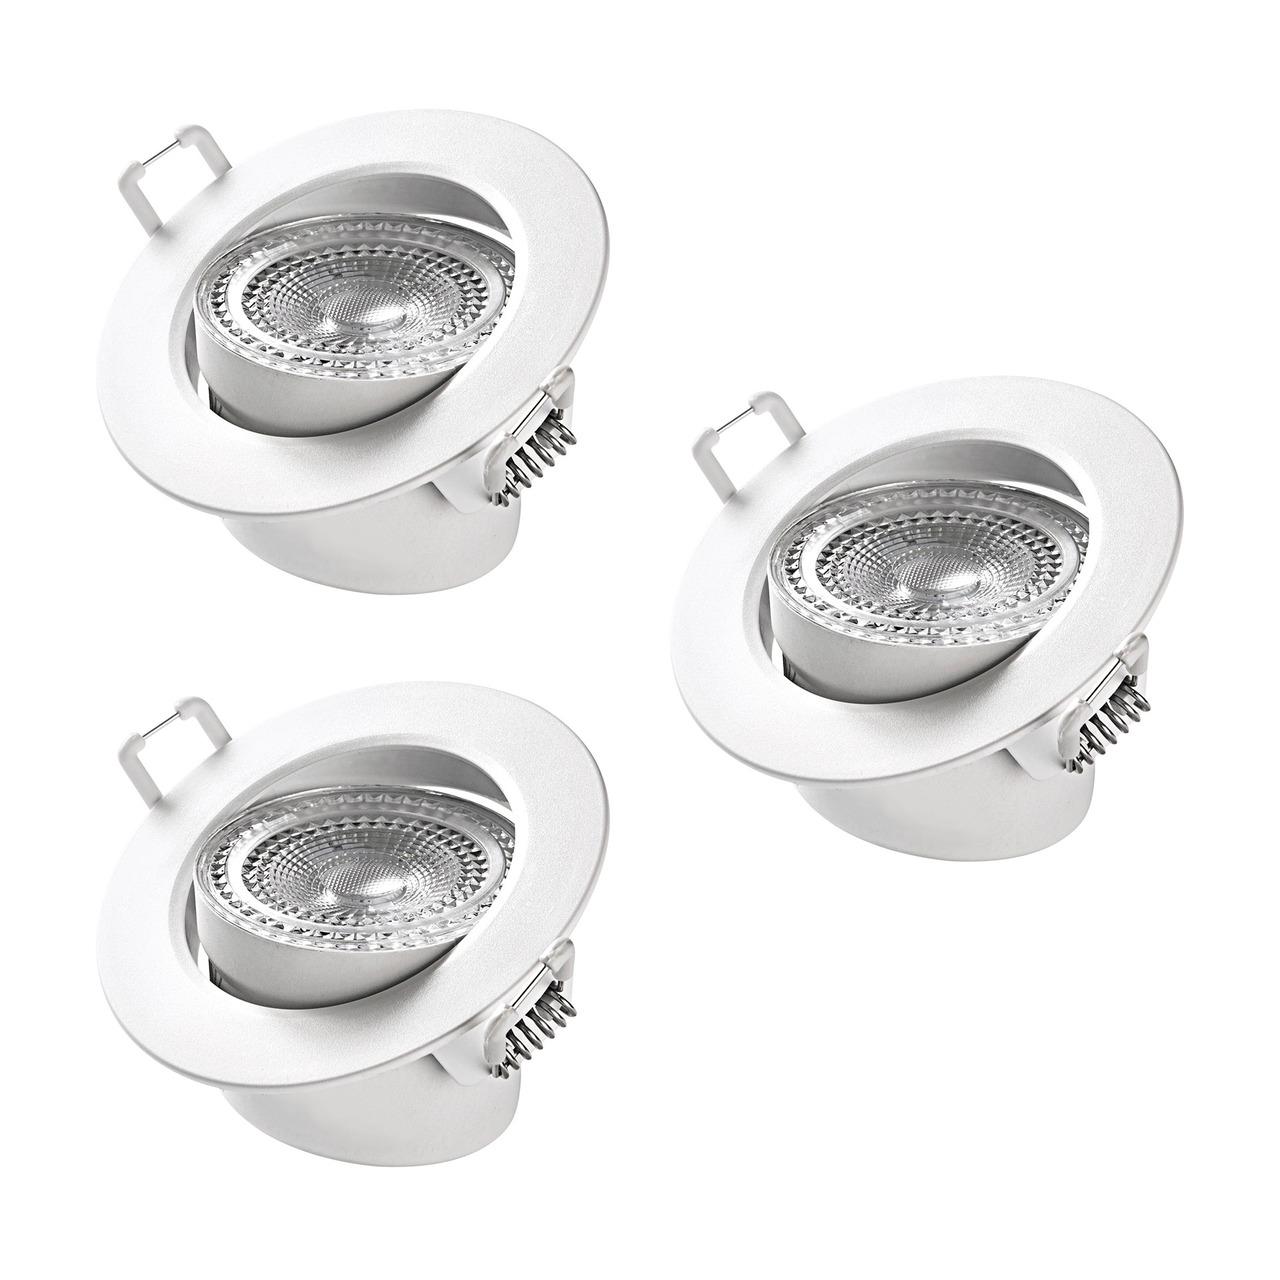 3er-Spar-Set - HEITRONIC 5-5-W-LED-Einbaustrahler DL7002- austauschbare Kunststoffringe- schwenkbar